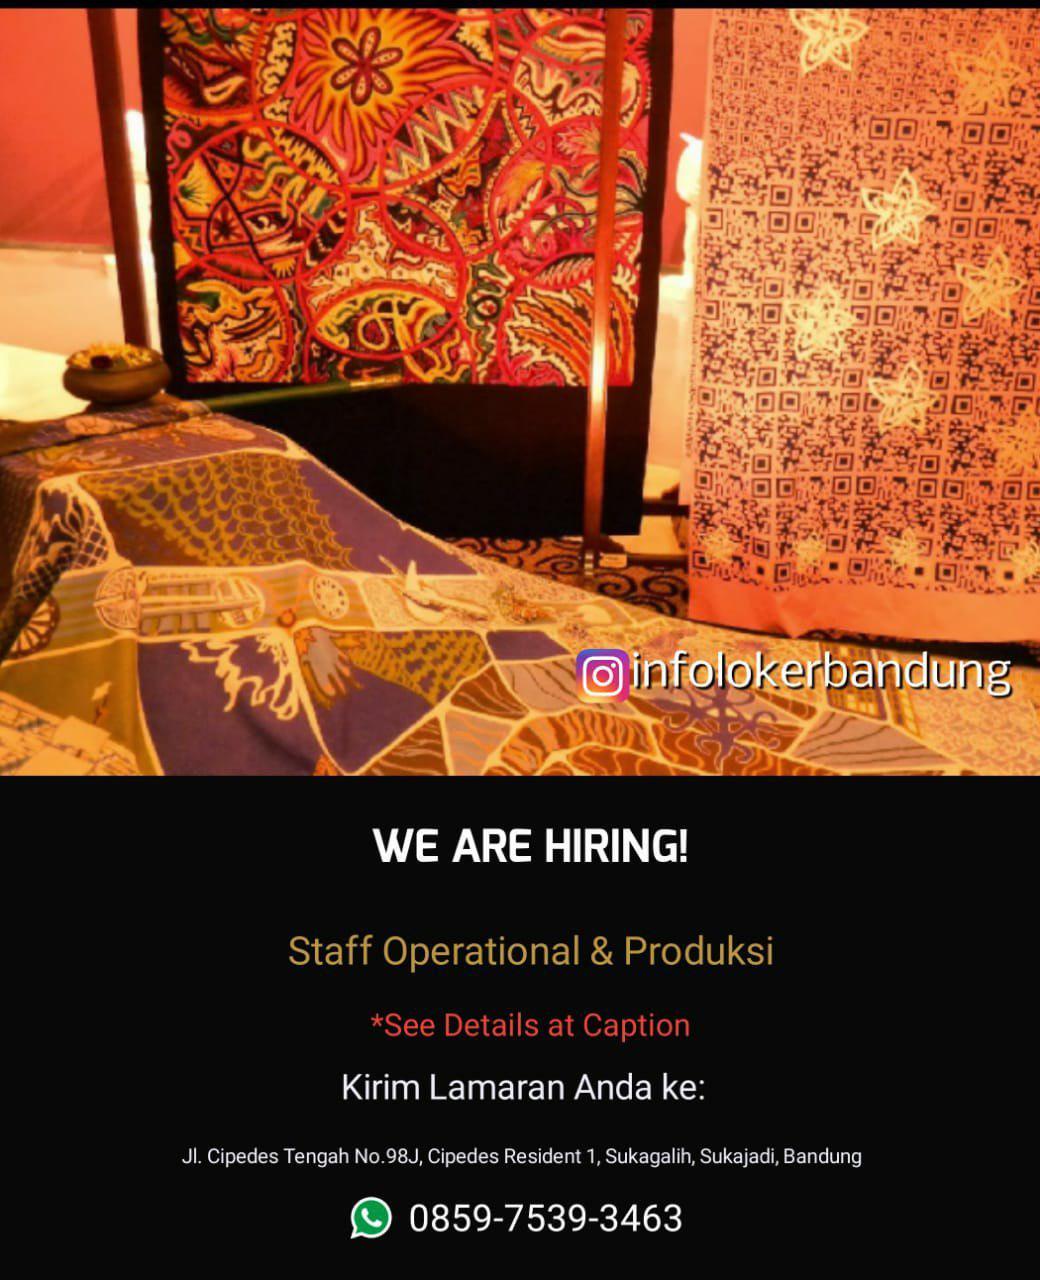 Lowongan Kerja Staff Operational & Produksi PT. Bina Kreativ Berkah Bandung Agustus 2018